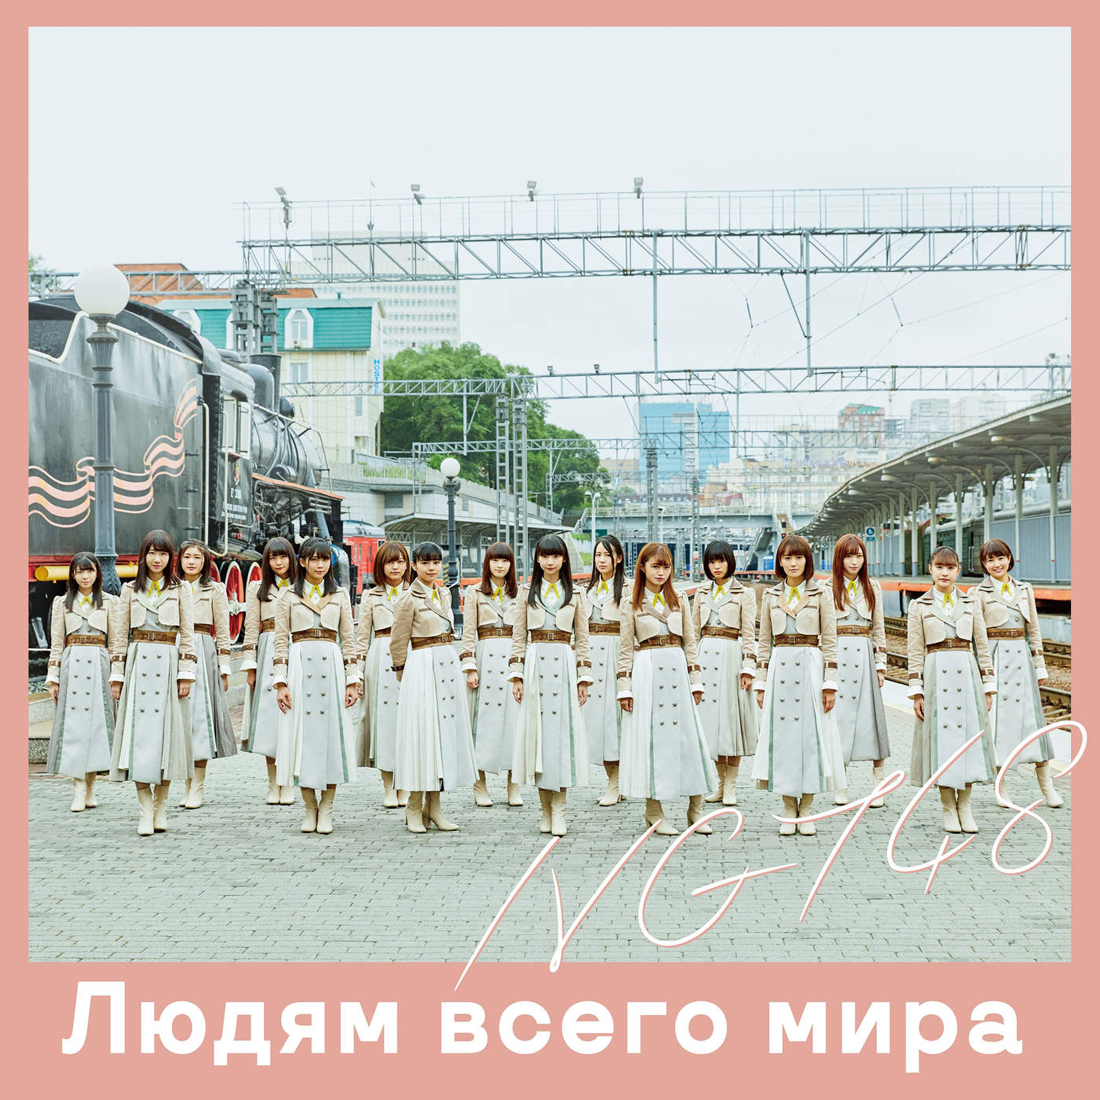 20181003.1905.05 NGT48 - Sekai no Hito e (web special edition) (M4A) cover 1.jpg